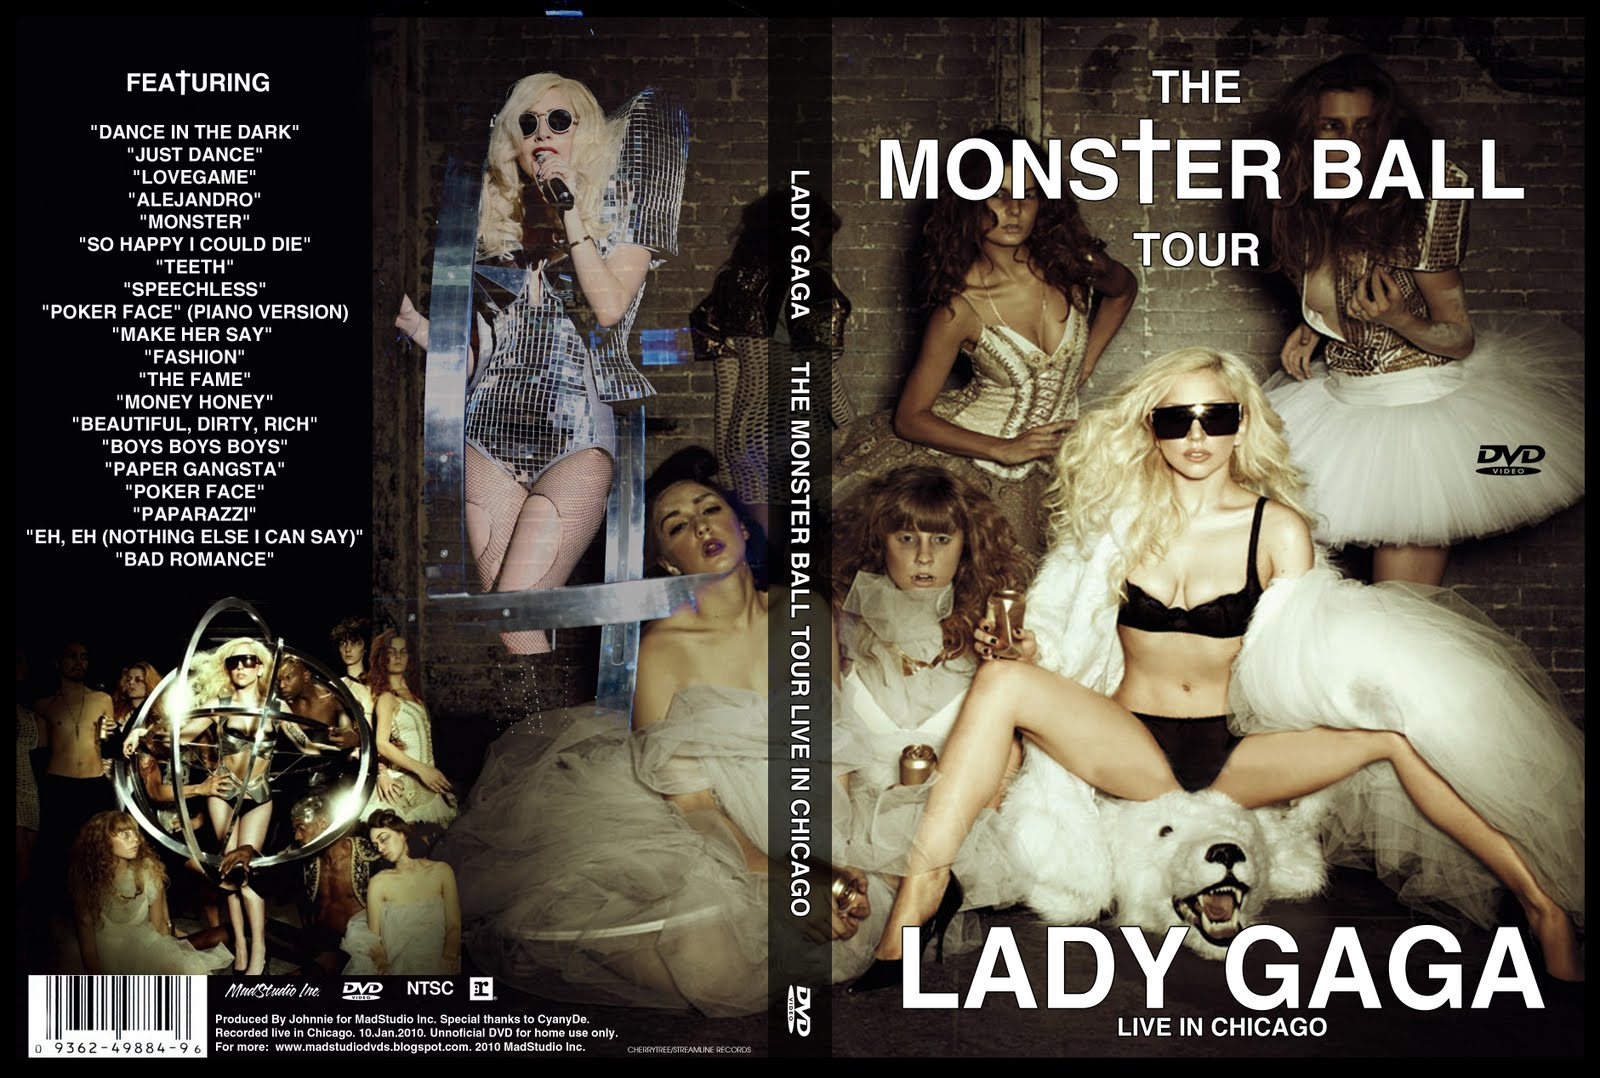 http://3.bp.blogspot.com/_0J83RjgAoBI/TFxNeDT8IJI/AAAAAAAAKAs/-SADsc4qEJI/s1600/Lady+Gaga+-+The+Monster+Ball+Tour+-+Live+in+Chicago.jpg